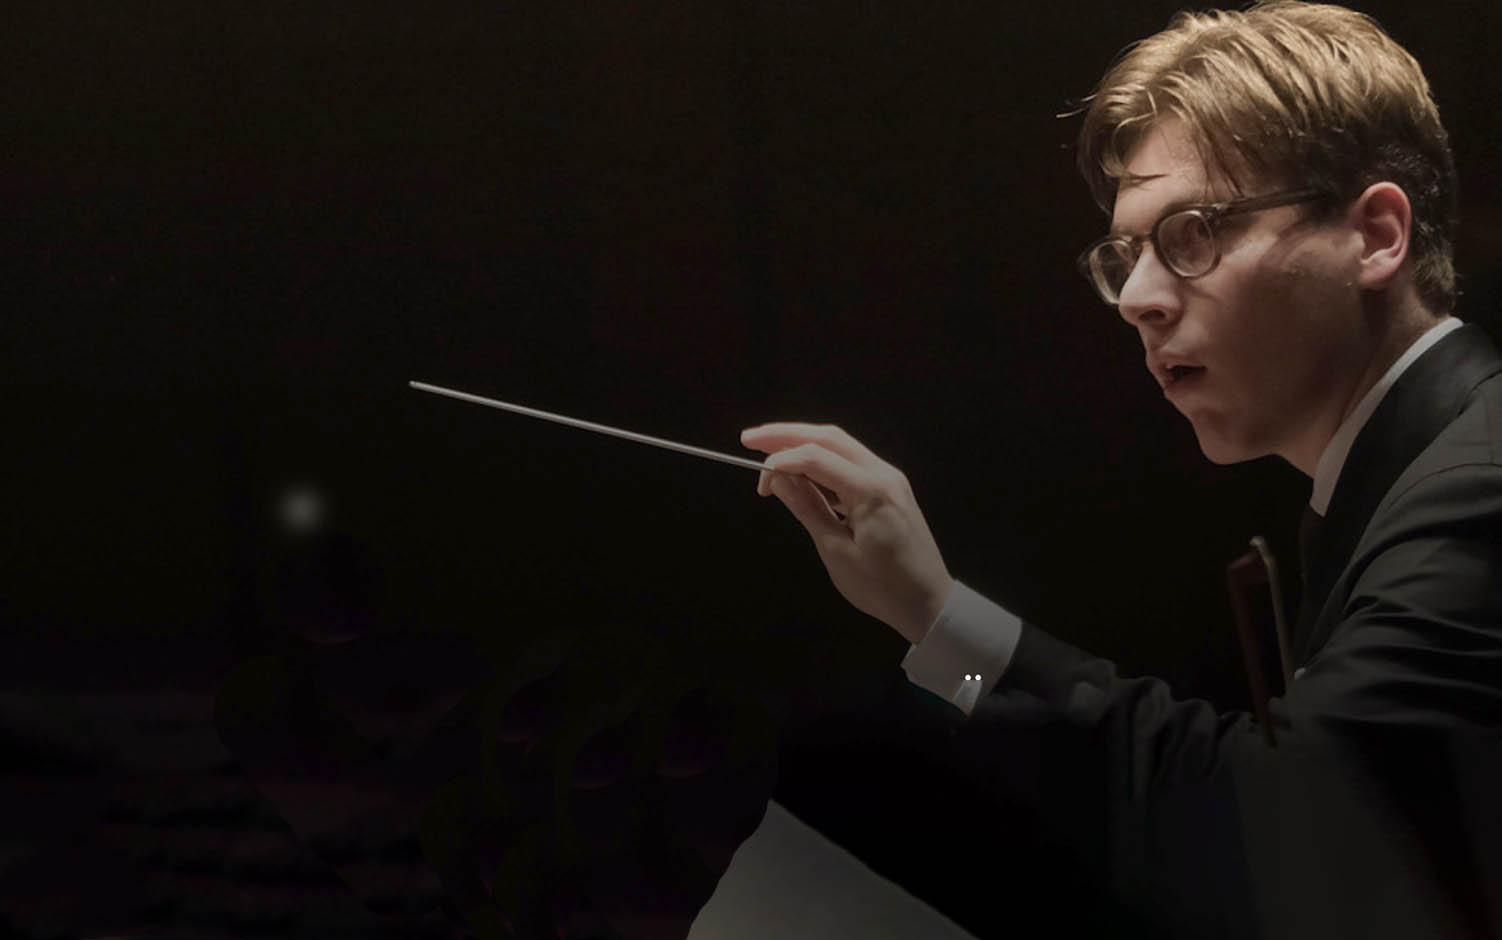 – Världens kanske mest perfekta symfoni